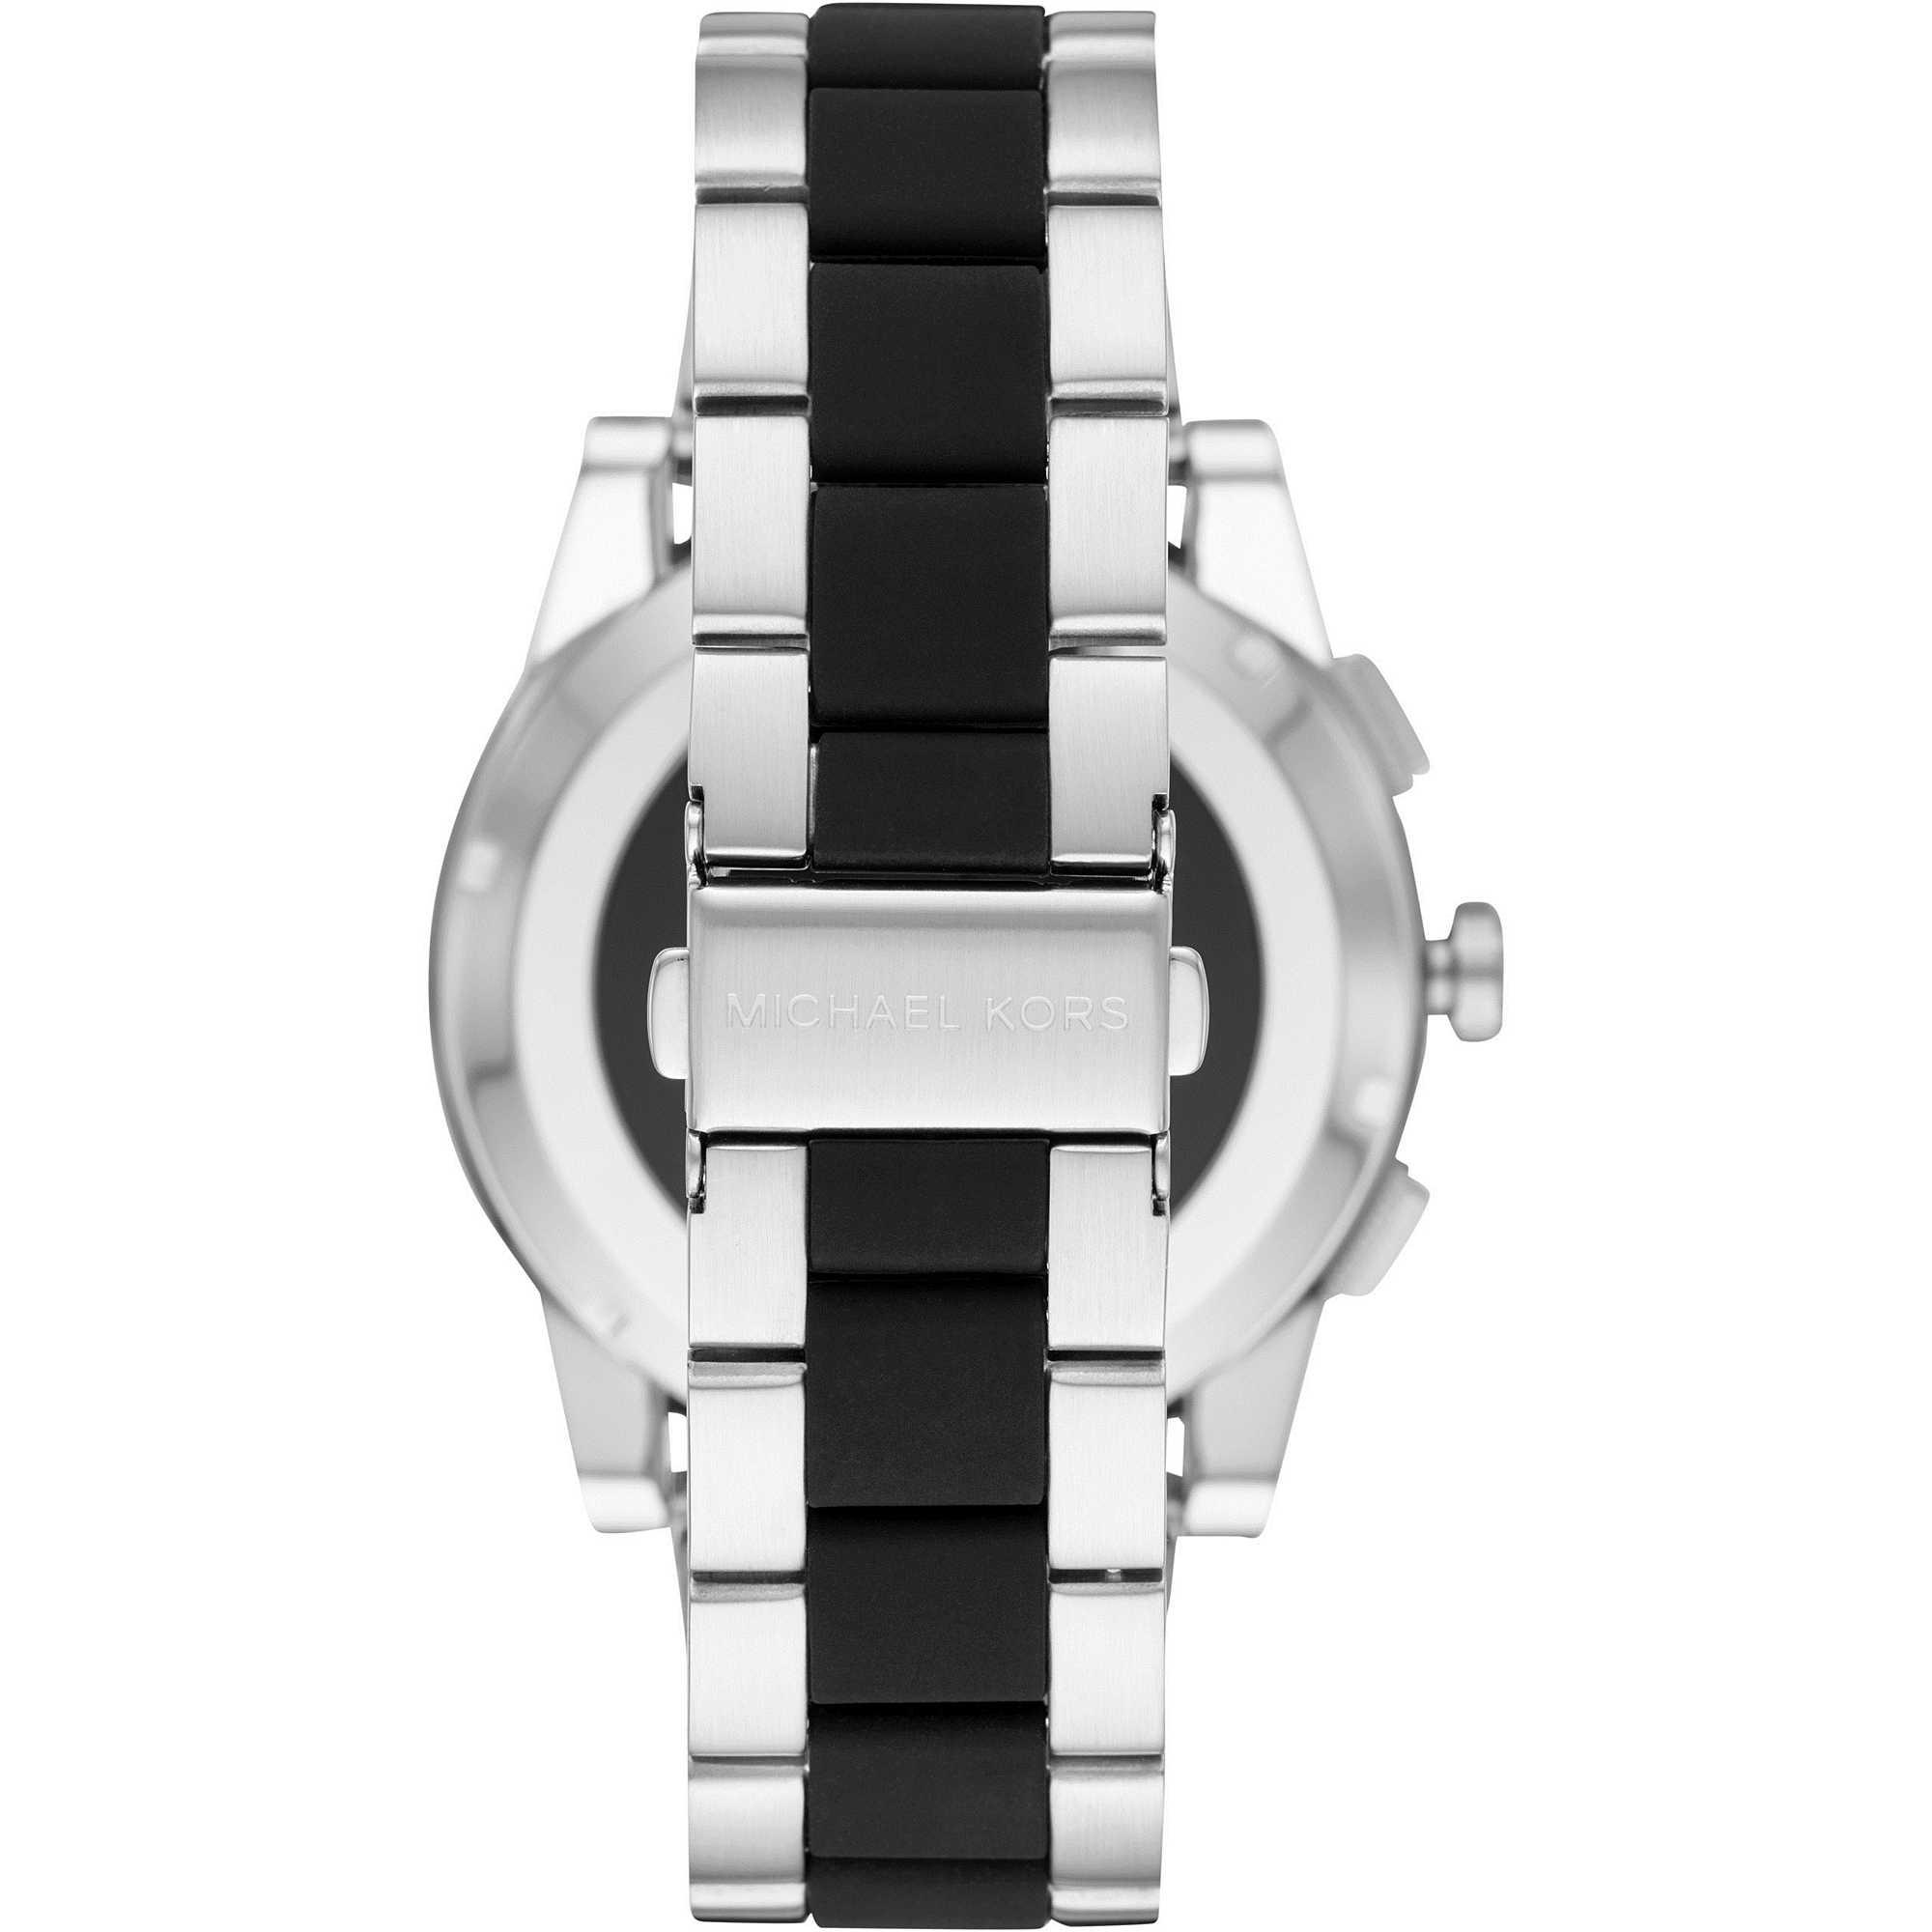 7b4080ed21ce2 orologio Smartwatch uomo Michael Kors Grayson MKT5037 Smartwatches ...